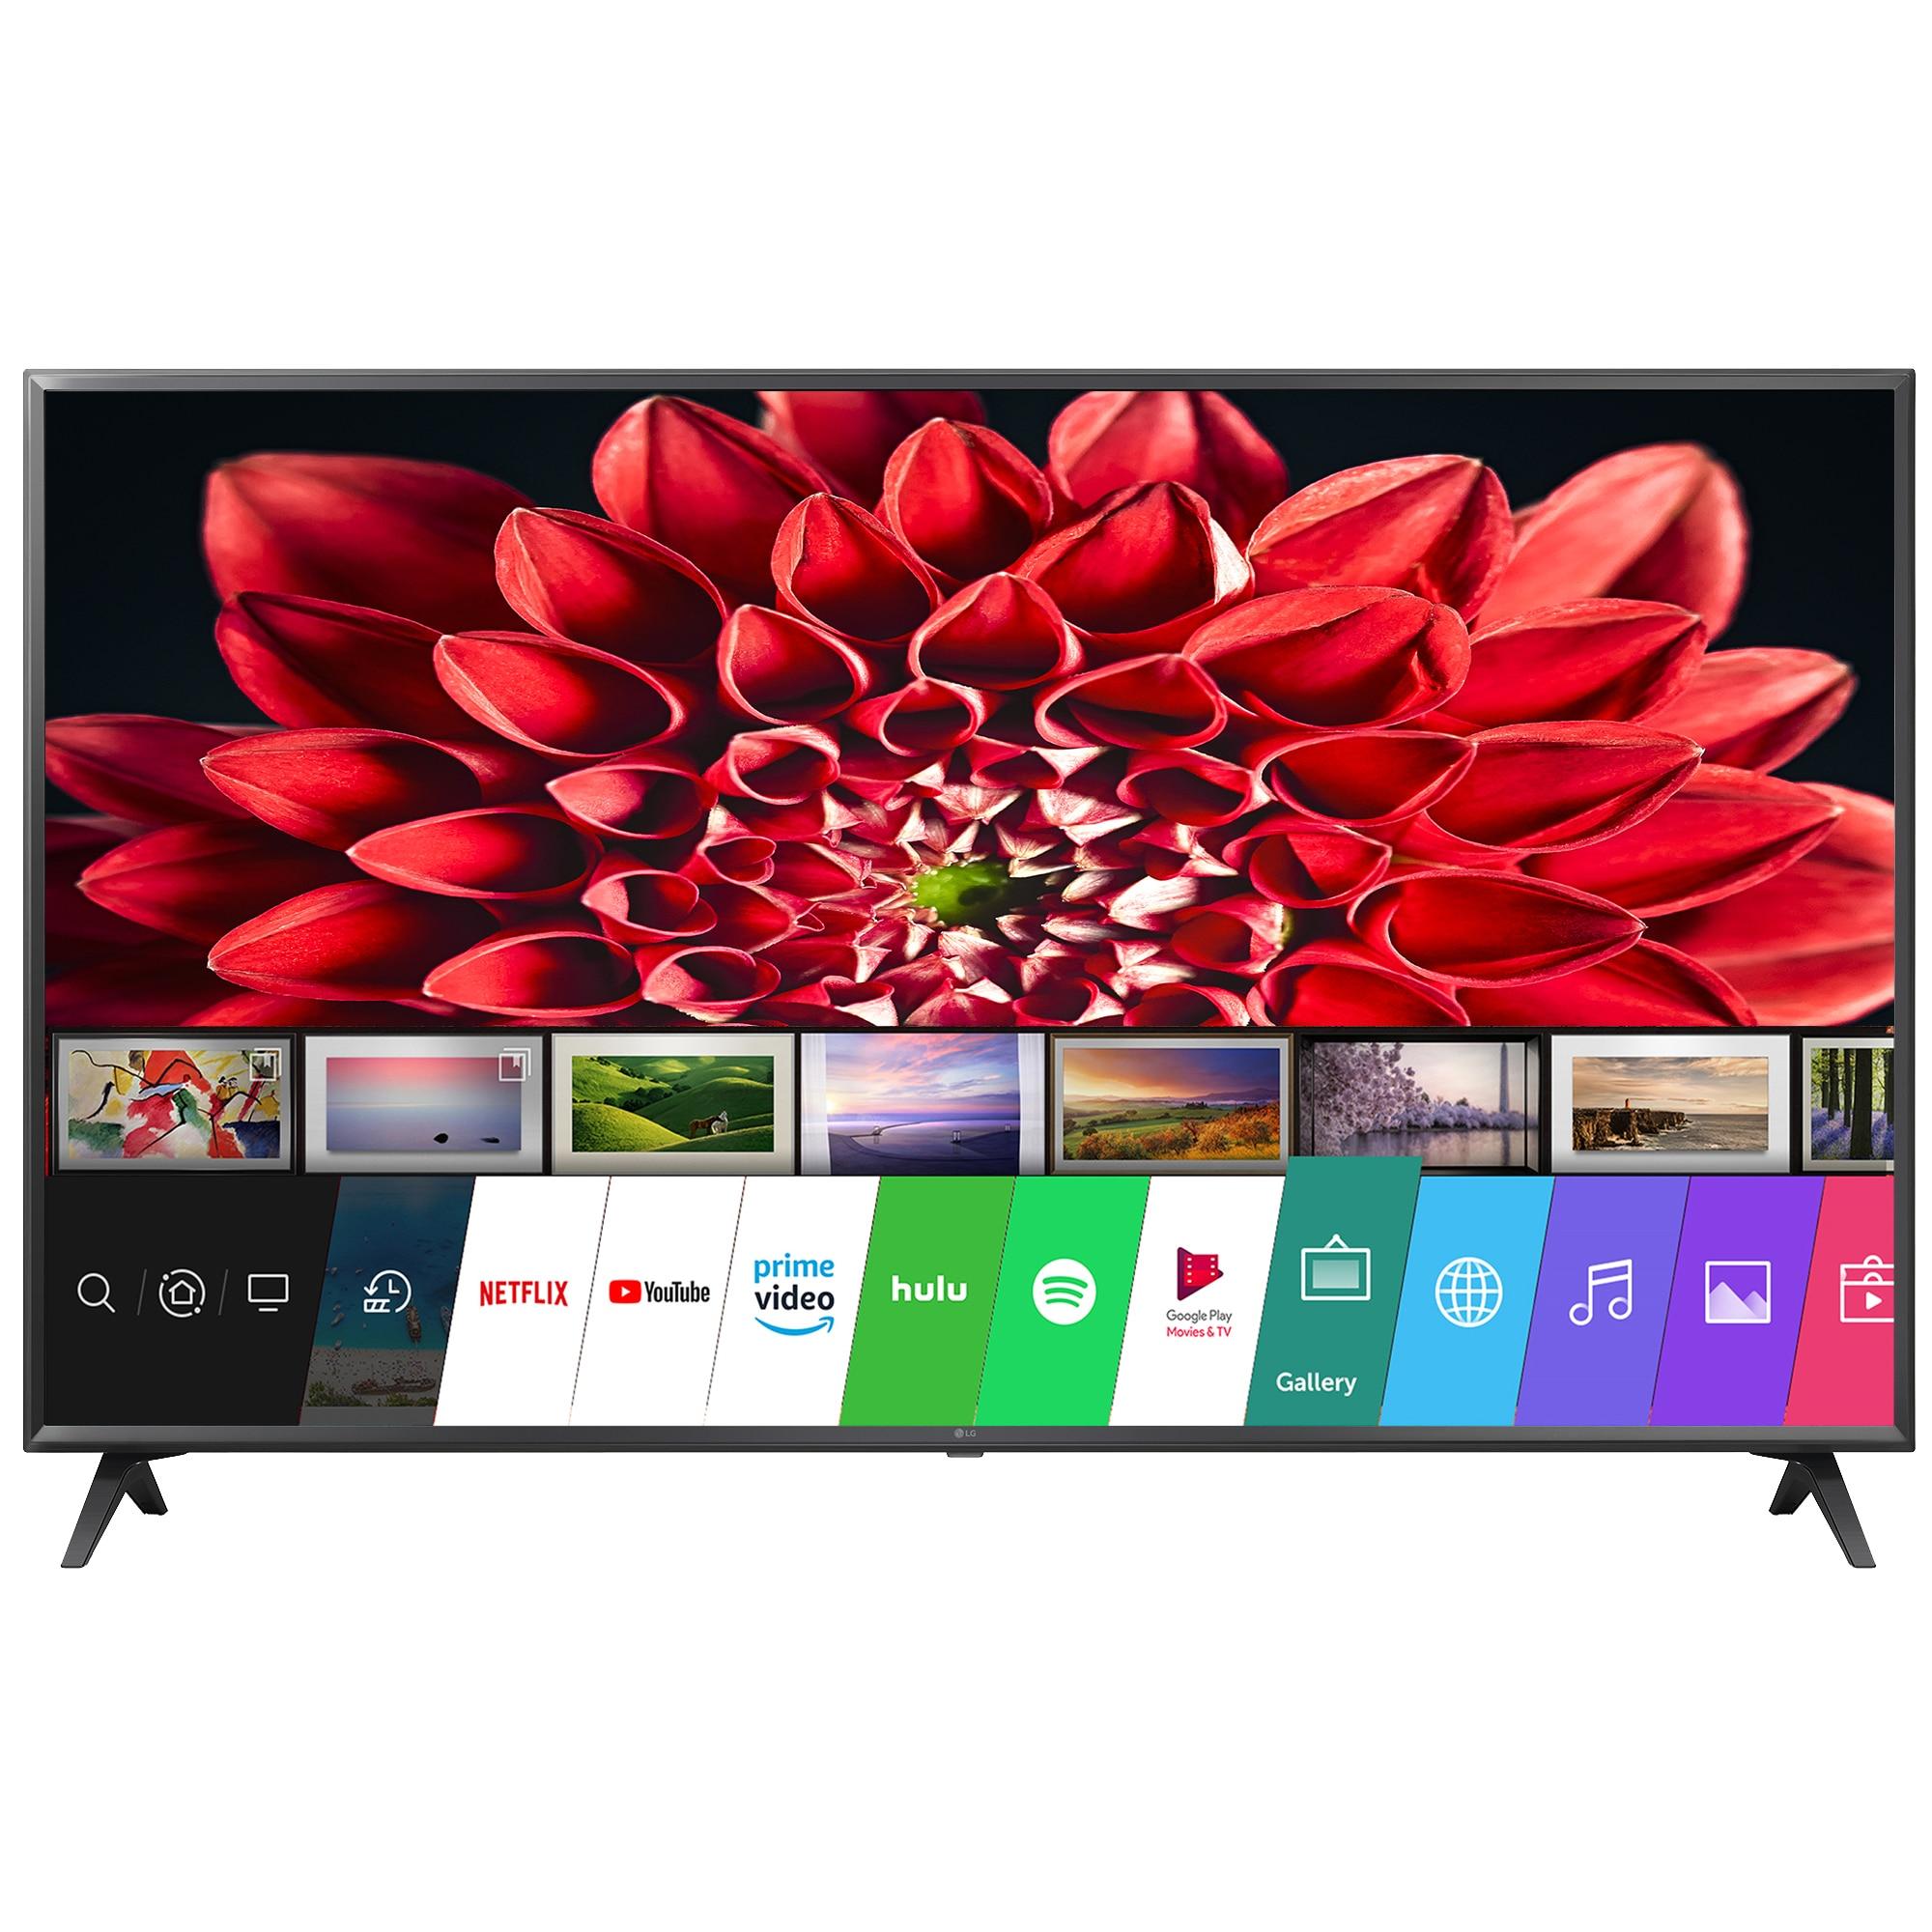 Fotografie Televizor LG 65UN71003LB, 164 cm, Smart, 4K Ultra HD, LED, Clasa G